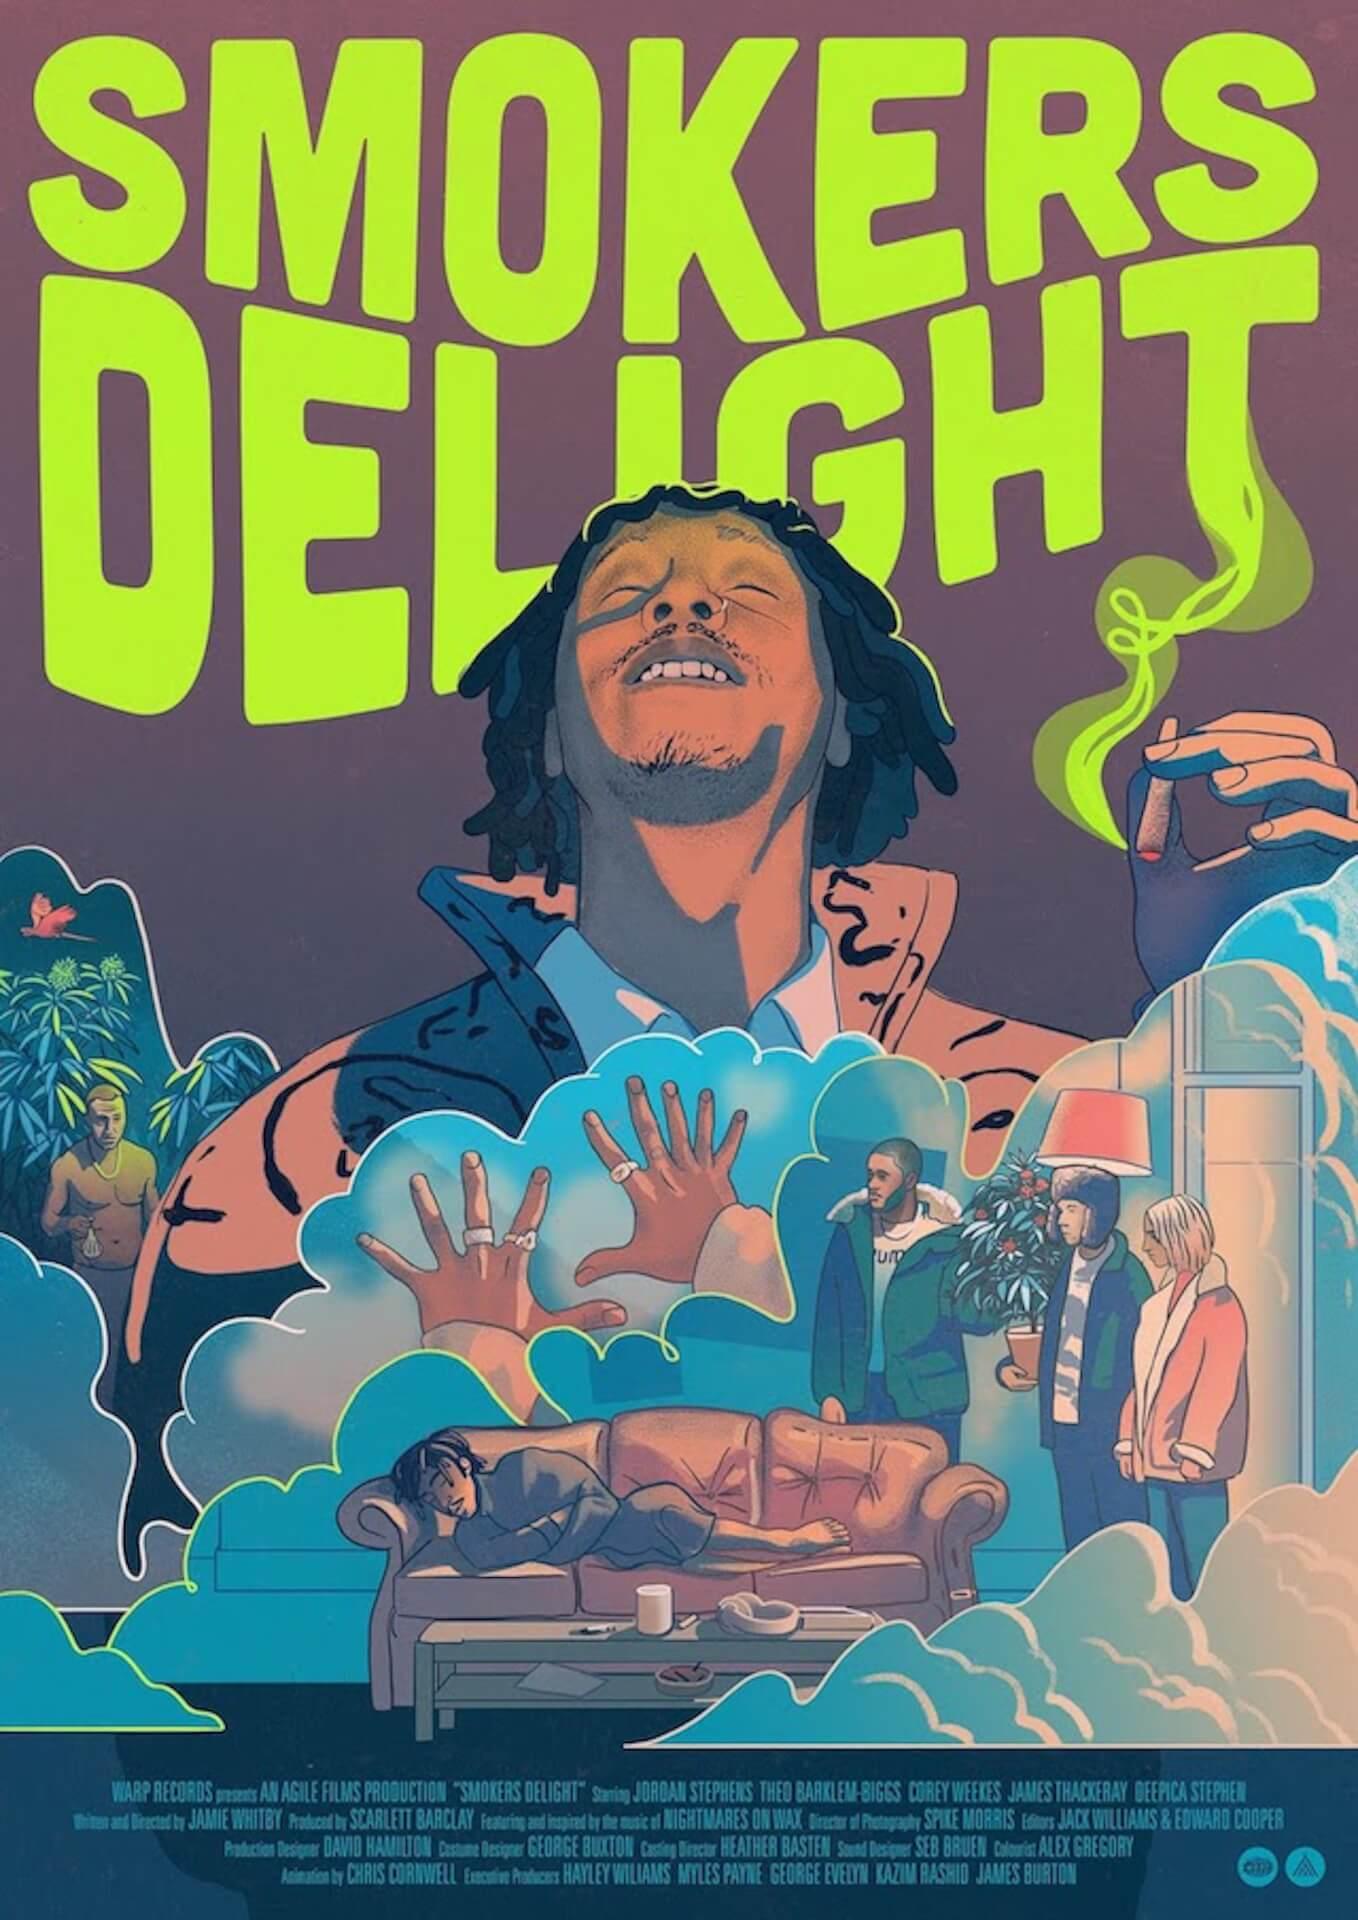 Nightmares On Wax本人が見た夢にインスパイアされたショートフィルムが公開!歴史的名盤に新曲を追加した12インチ『Smokers Delight: Sonic Buds』が本日リリース music201016_nightmaresonwax_main